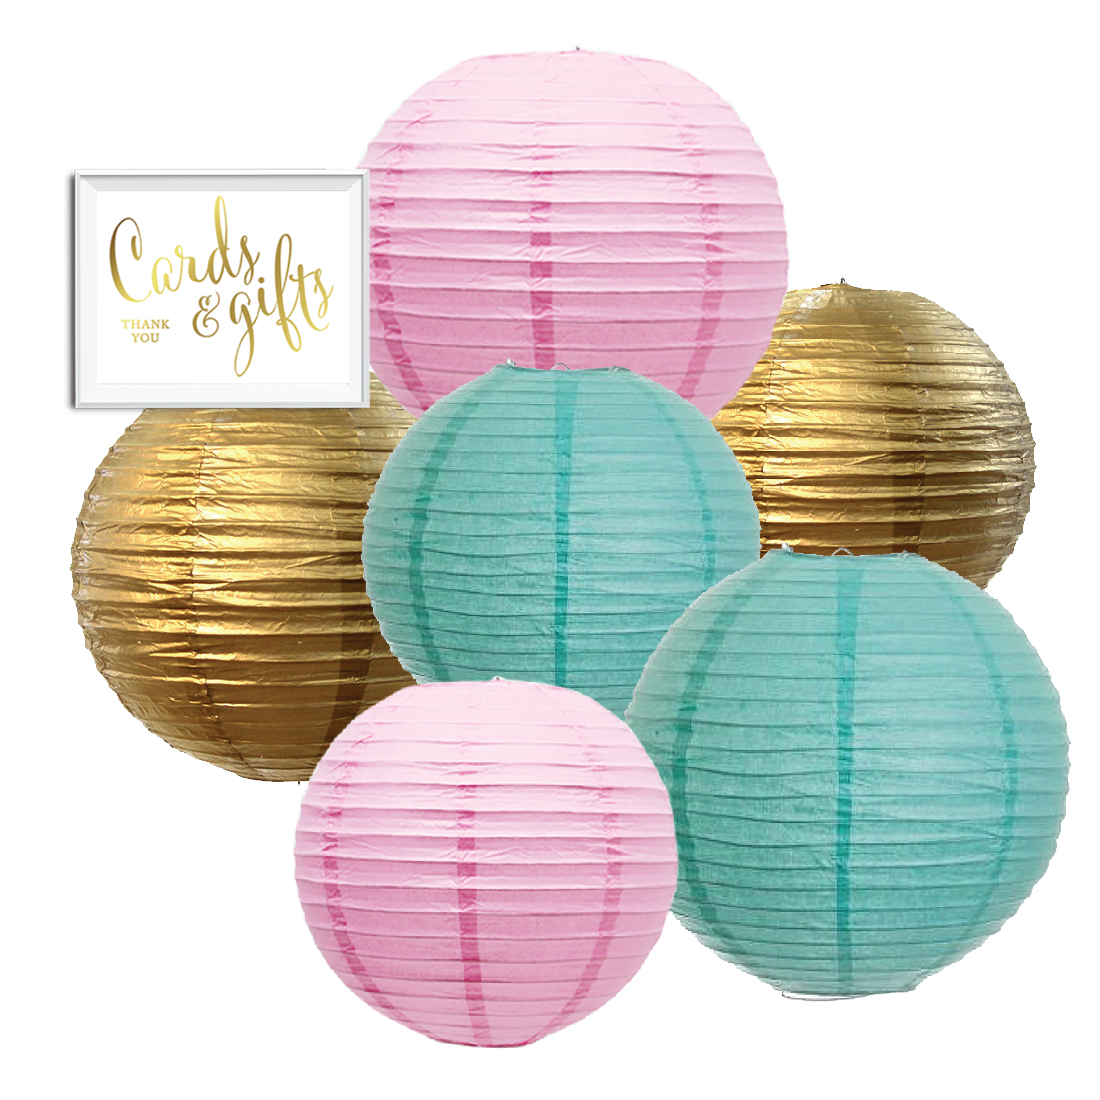 Easter Pastel Hanging Paper Lanterns Kit, 6ct with Party Sign (Blush Pink, DIamond Blue, Gold)